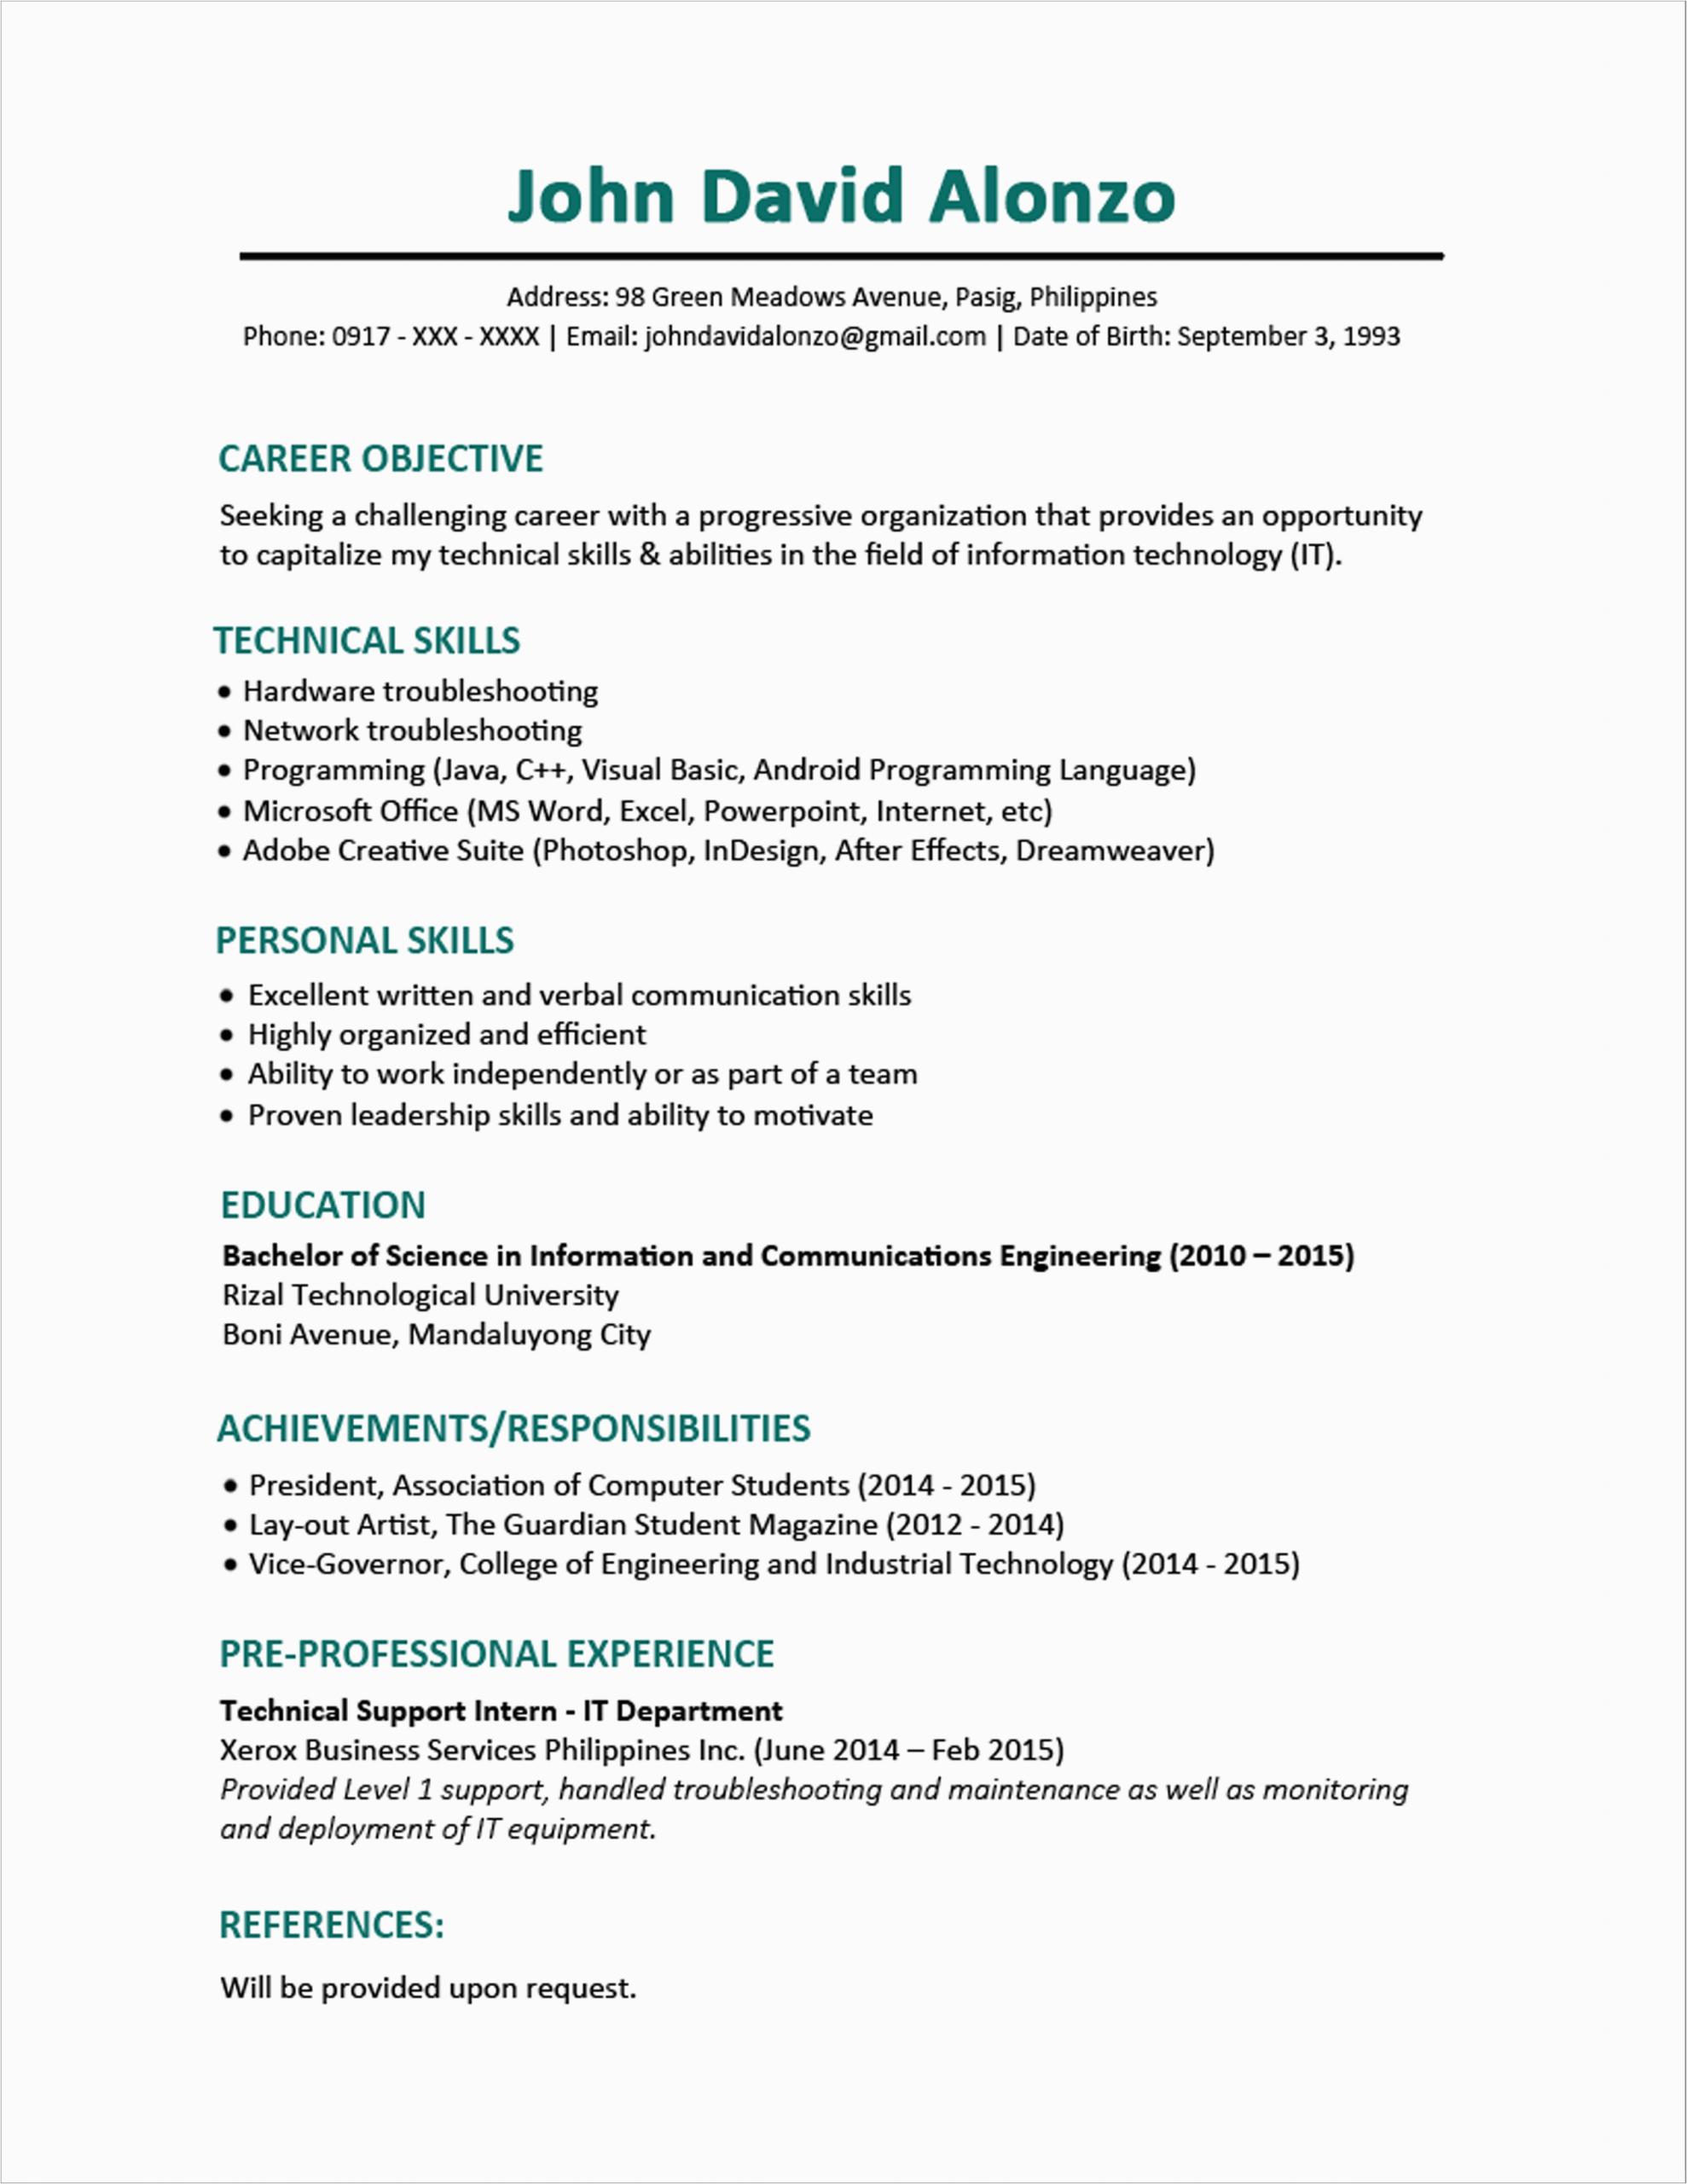 sample resume format fresh graduates single page